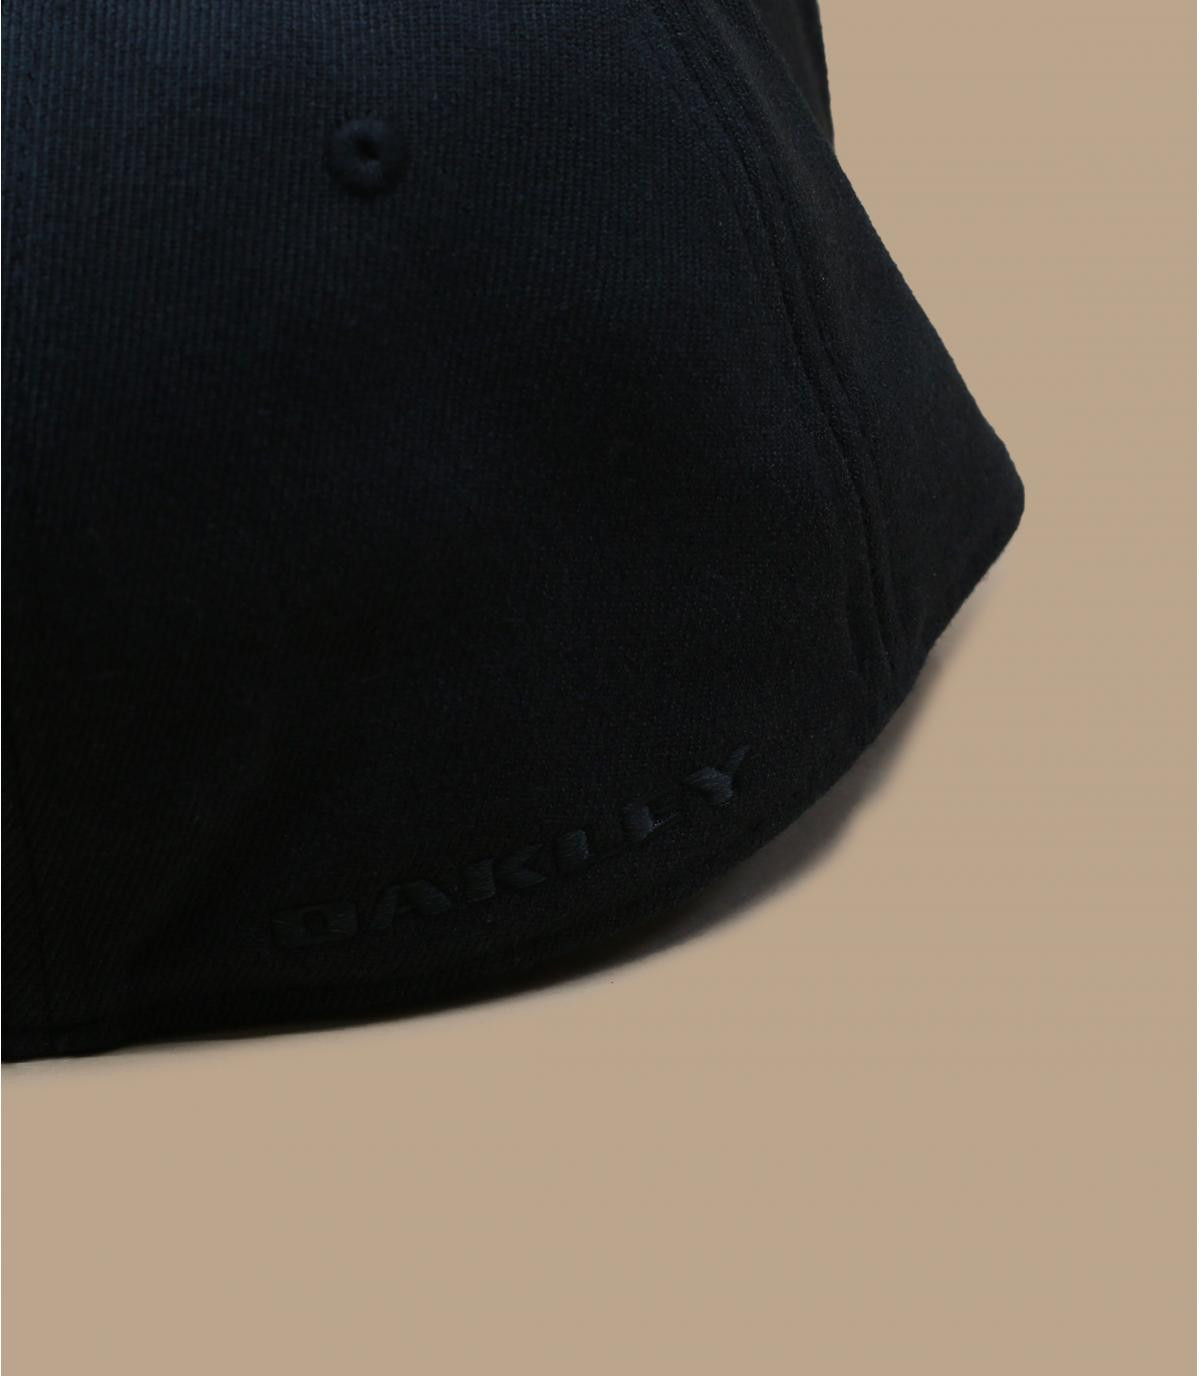 Details Tincan black graphic camo - afbeeling 3